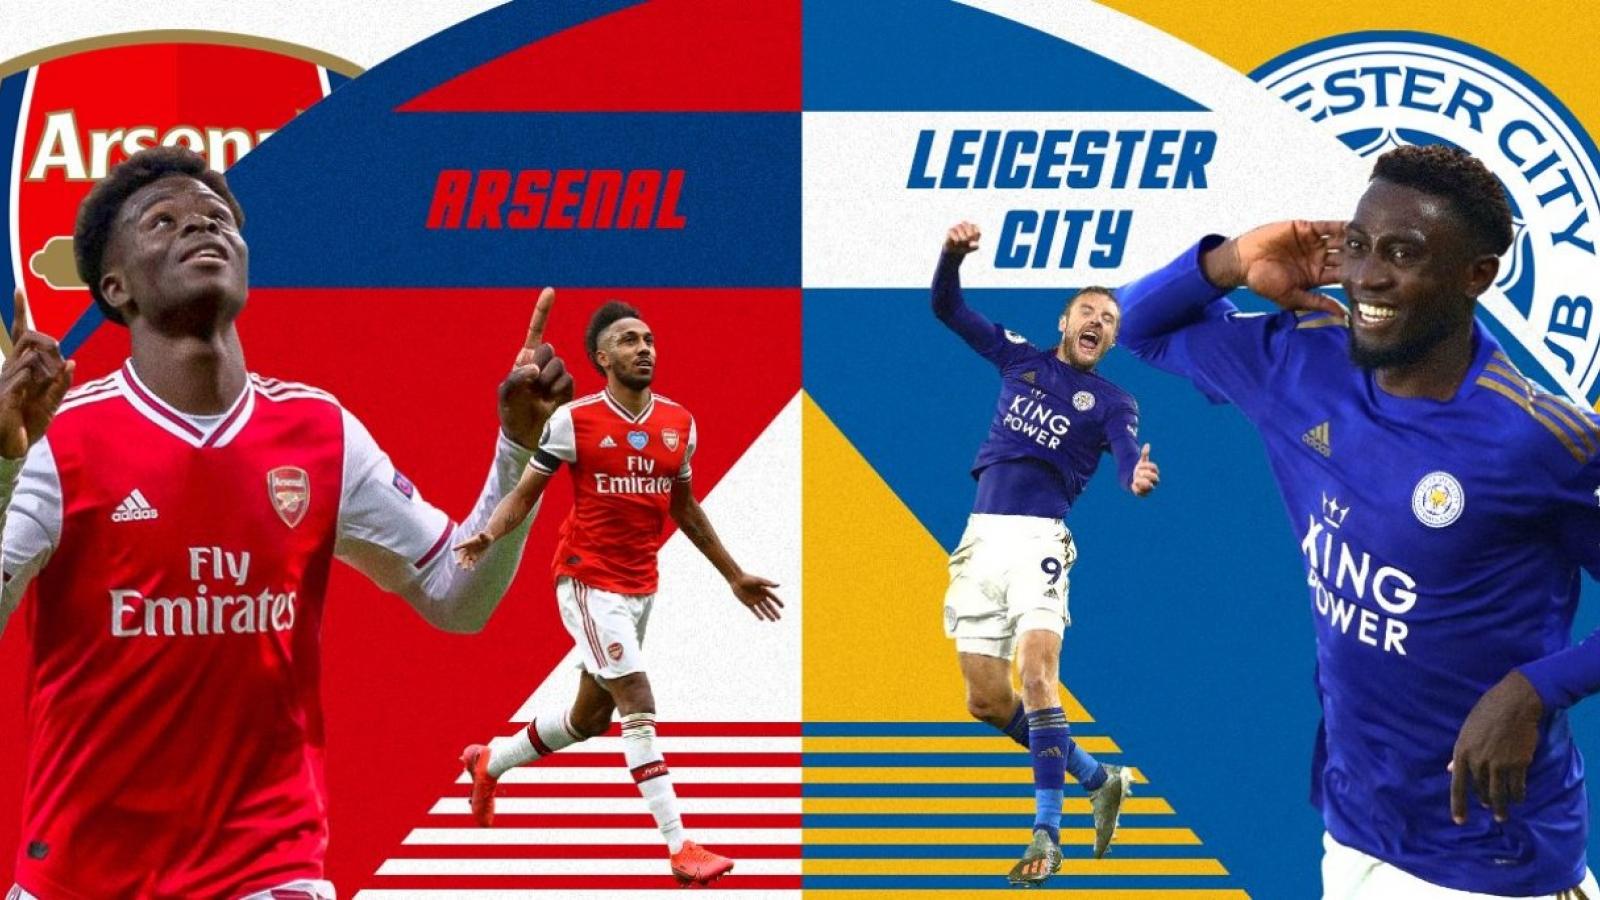 Đội hình dự kiến Arsenal - Leicester: Aubameyang đối đầu Jamie Vardy